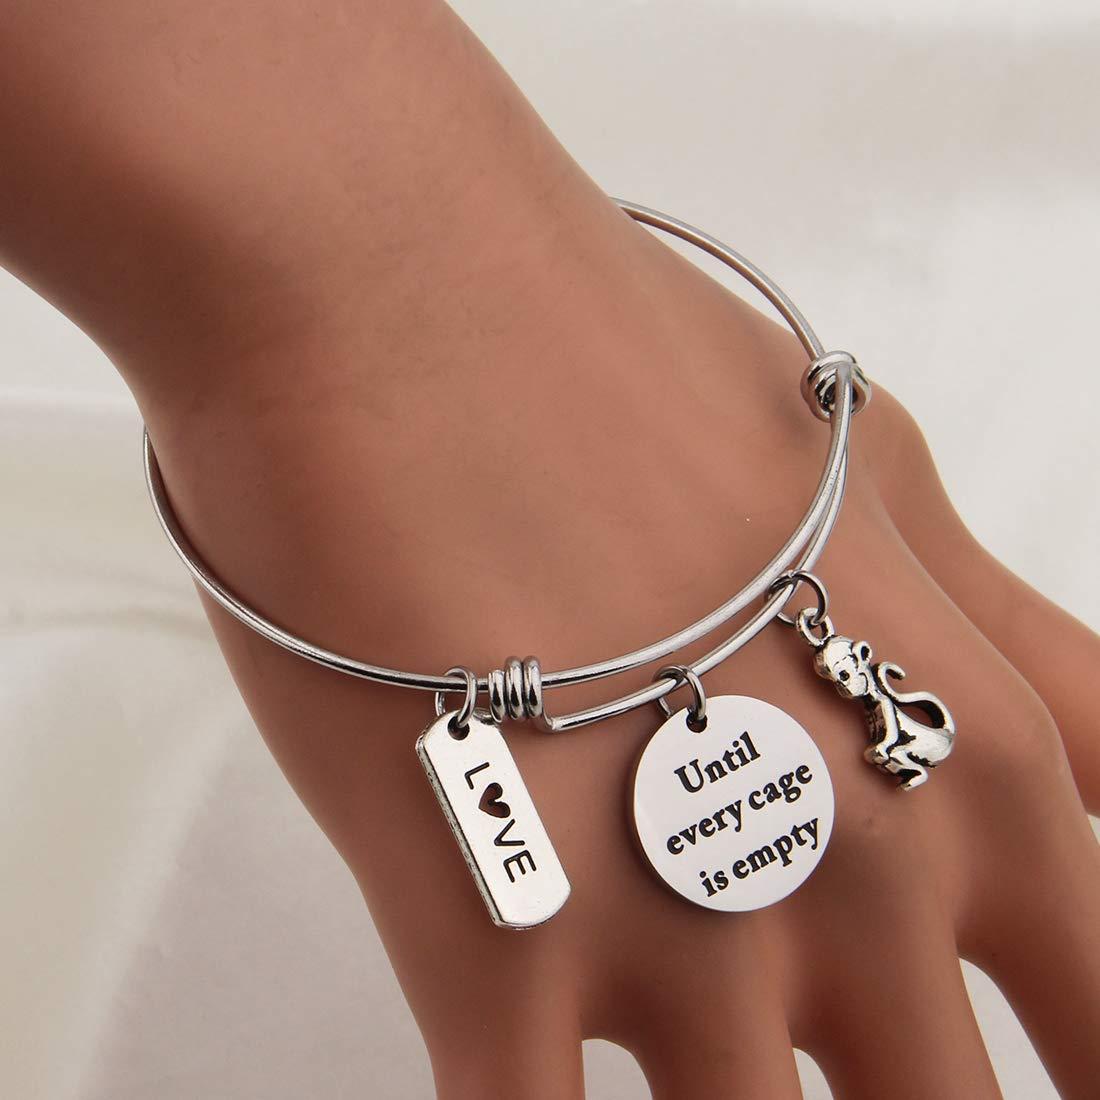 KUIYAI Until Every Cage is Empty Bracelet Animal Rescue Jewelry